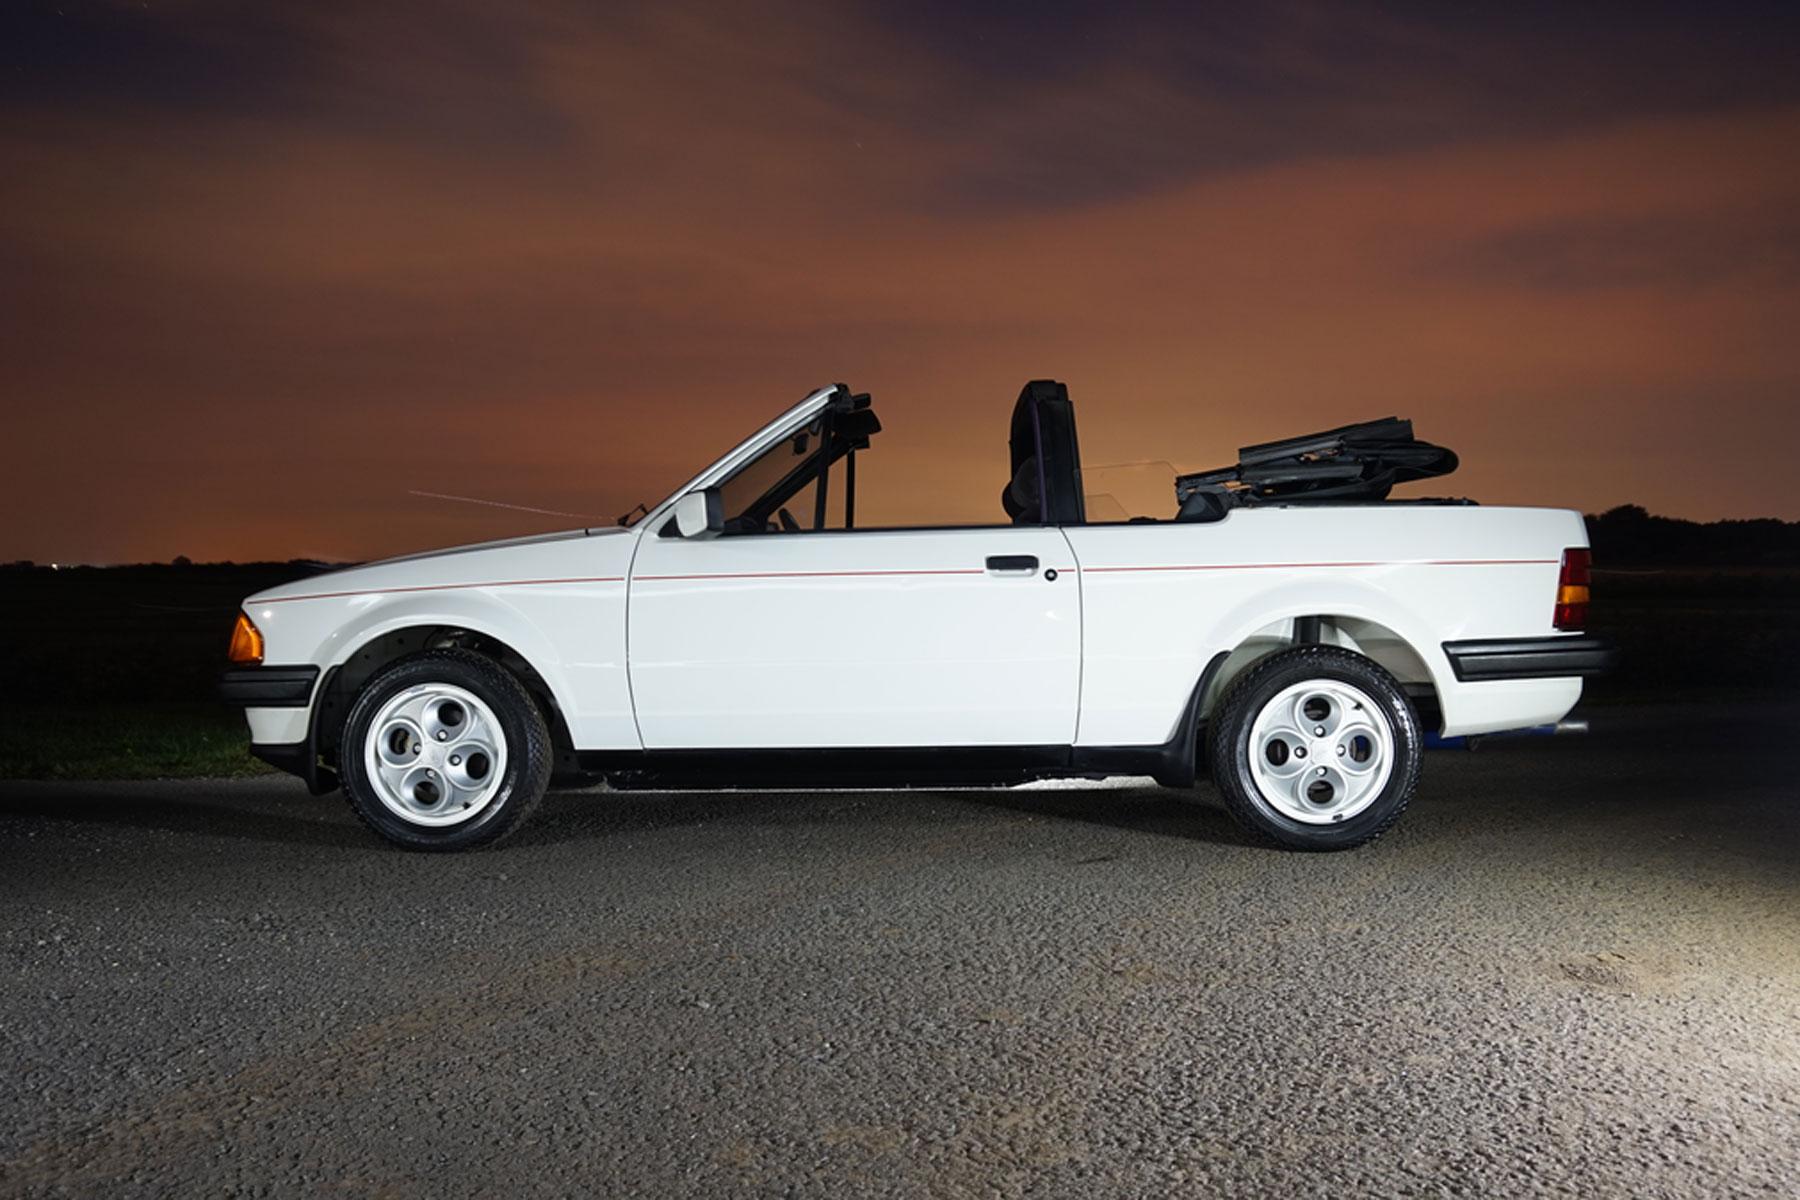 low mileage ford escort cabriolet stars in december auction. Black Bedroom Furniture Sets. Home Design Ideas